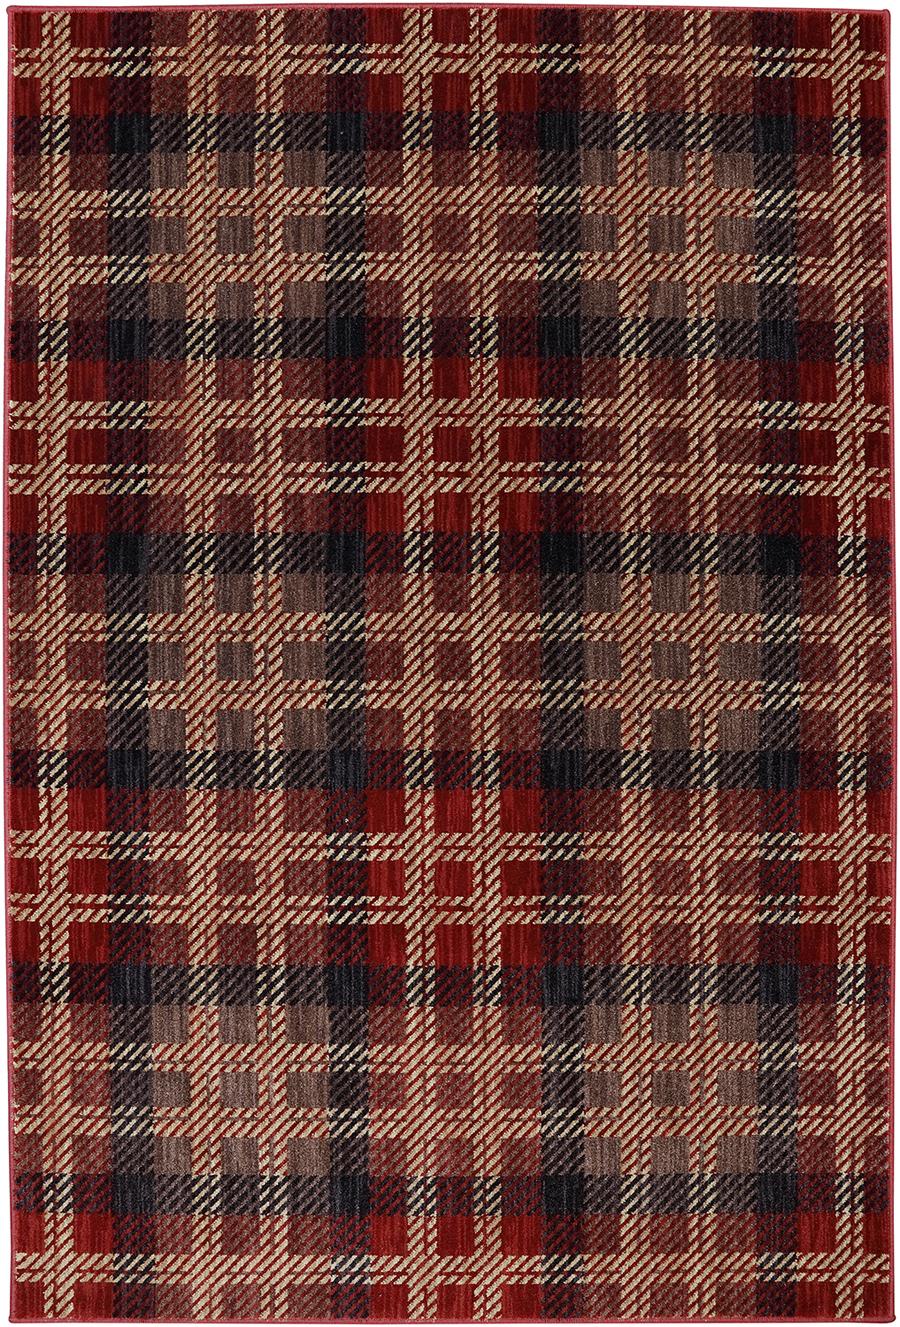 American Rug Craftsmen Dryden 90294 37001 Billings Crimson Rug